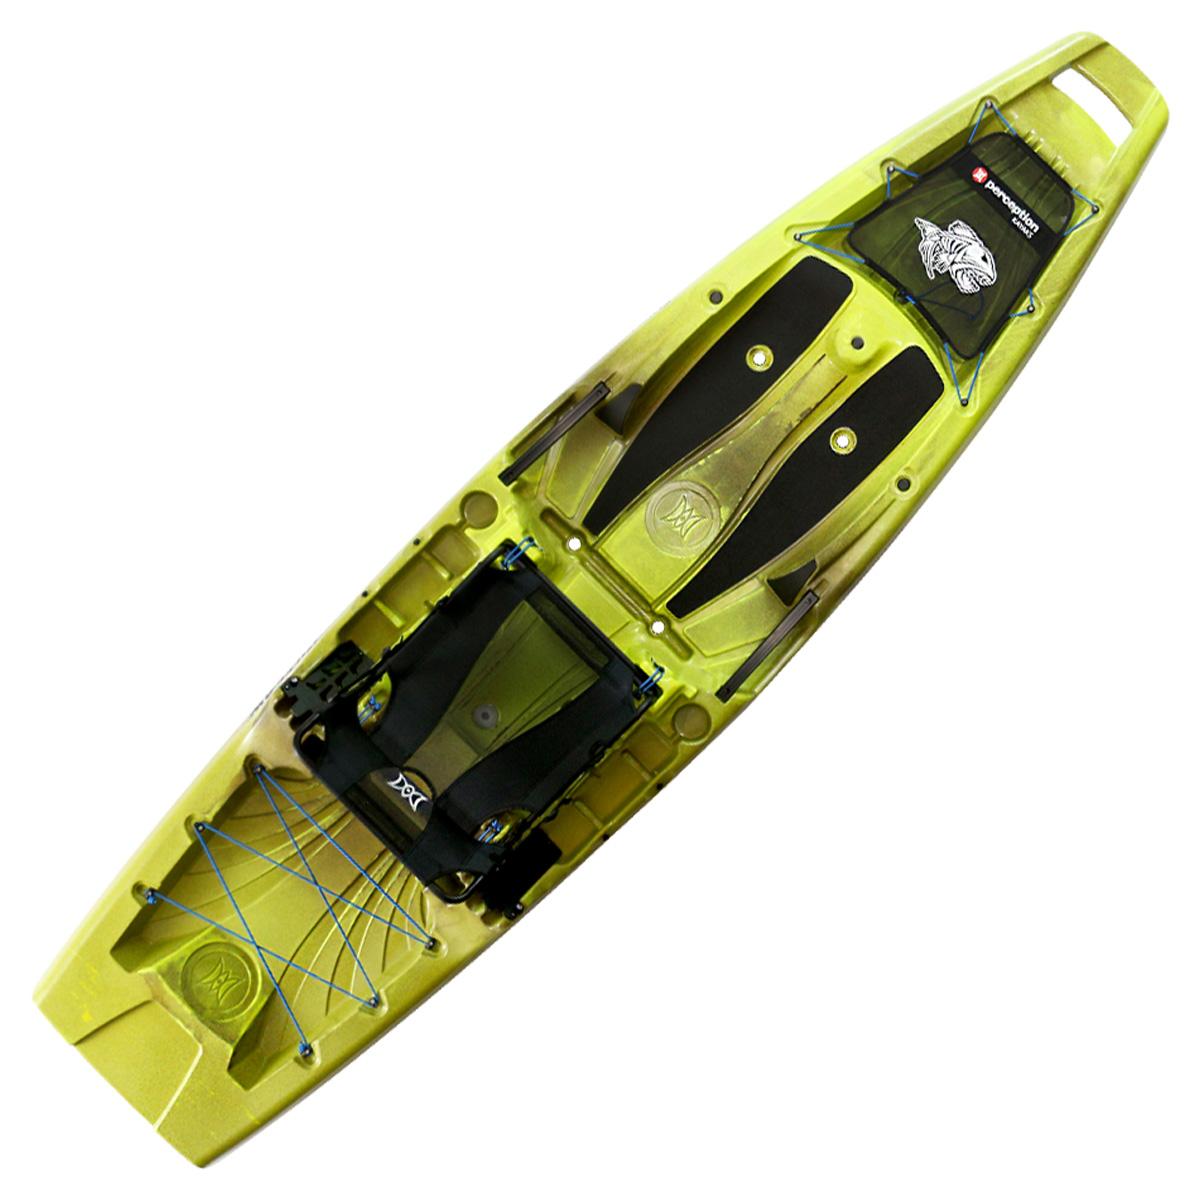 Perception Outlaw 11.5 Fishing Kayak Grasshopper